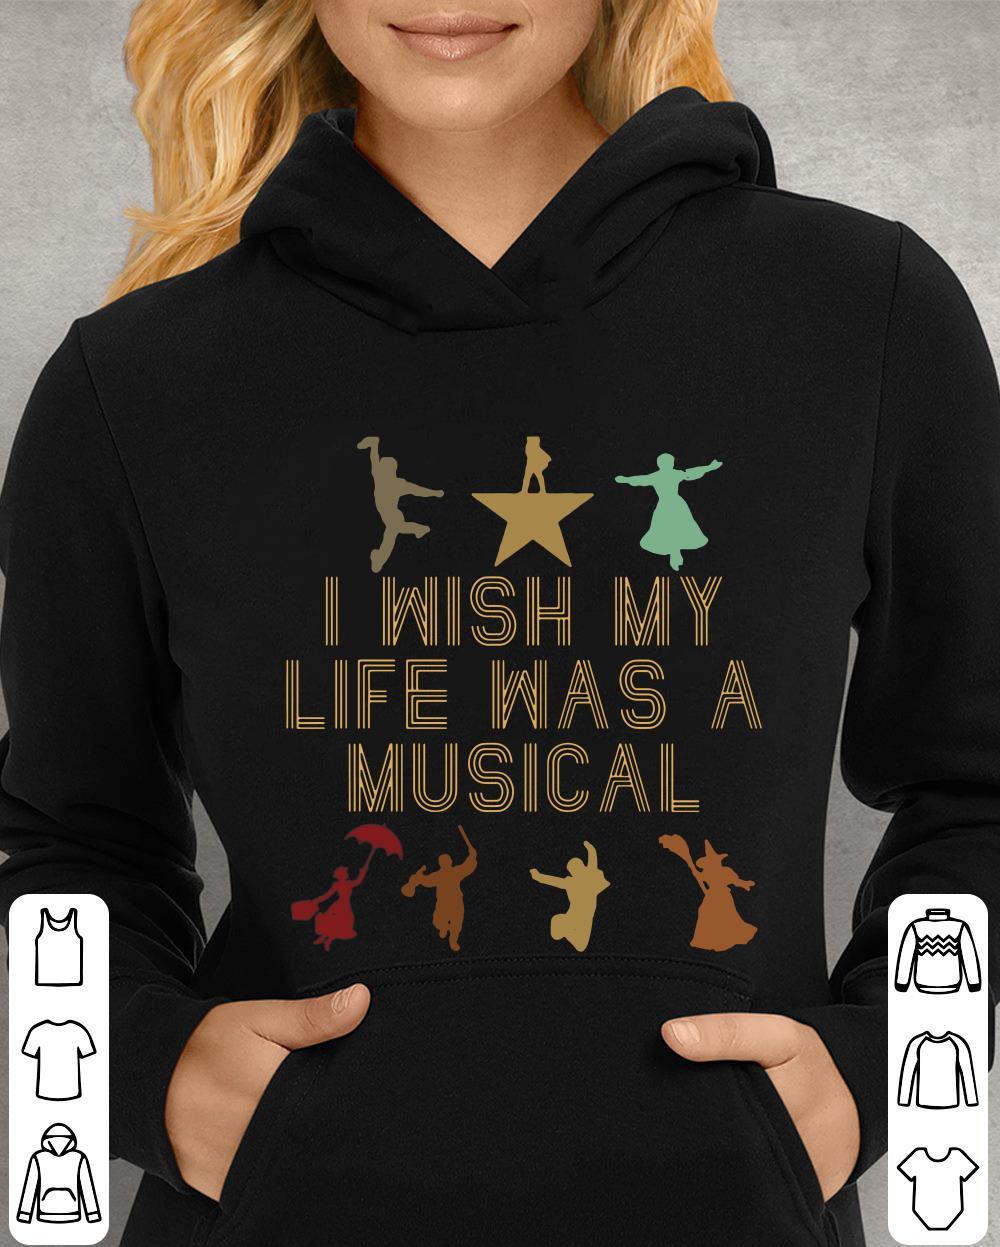 https://unicornshirts.net/images/2018/12/I-wish-my-life-was-a-musical-shirt_4.jpg